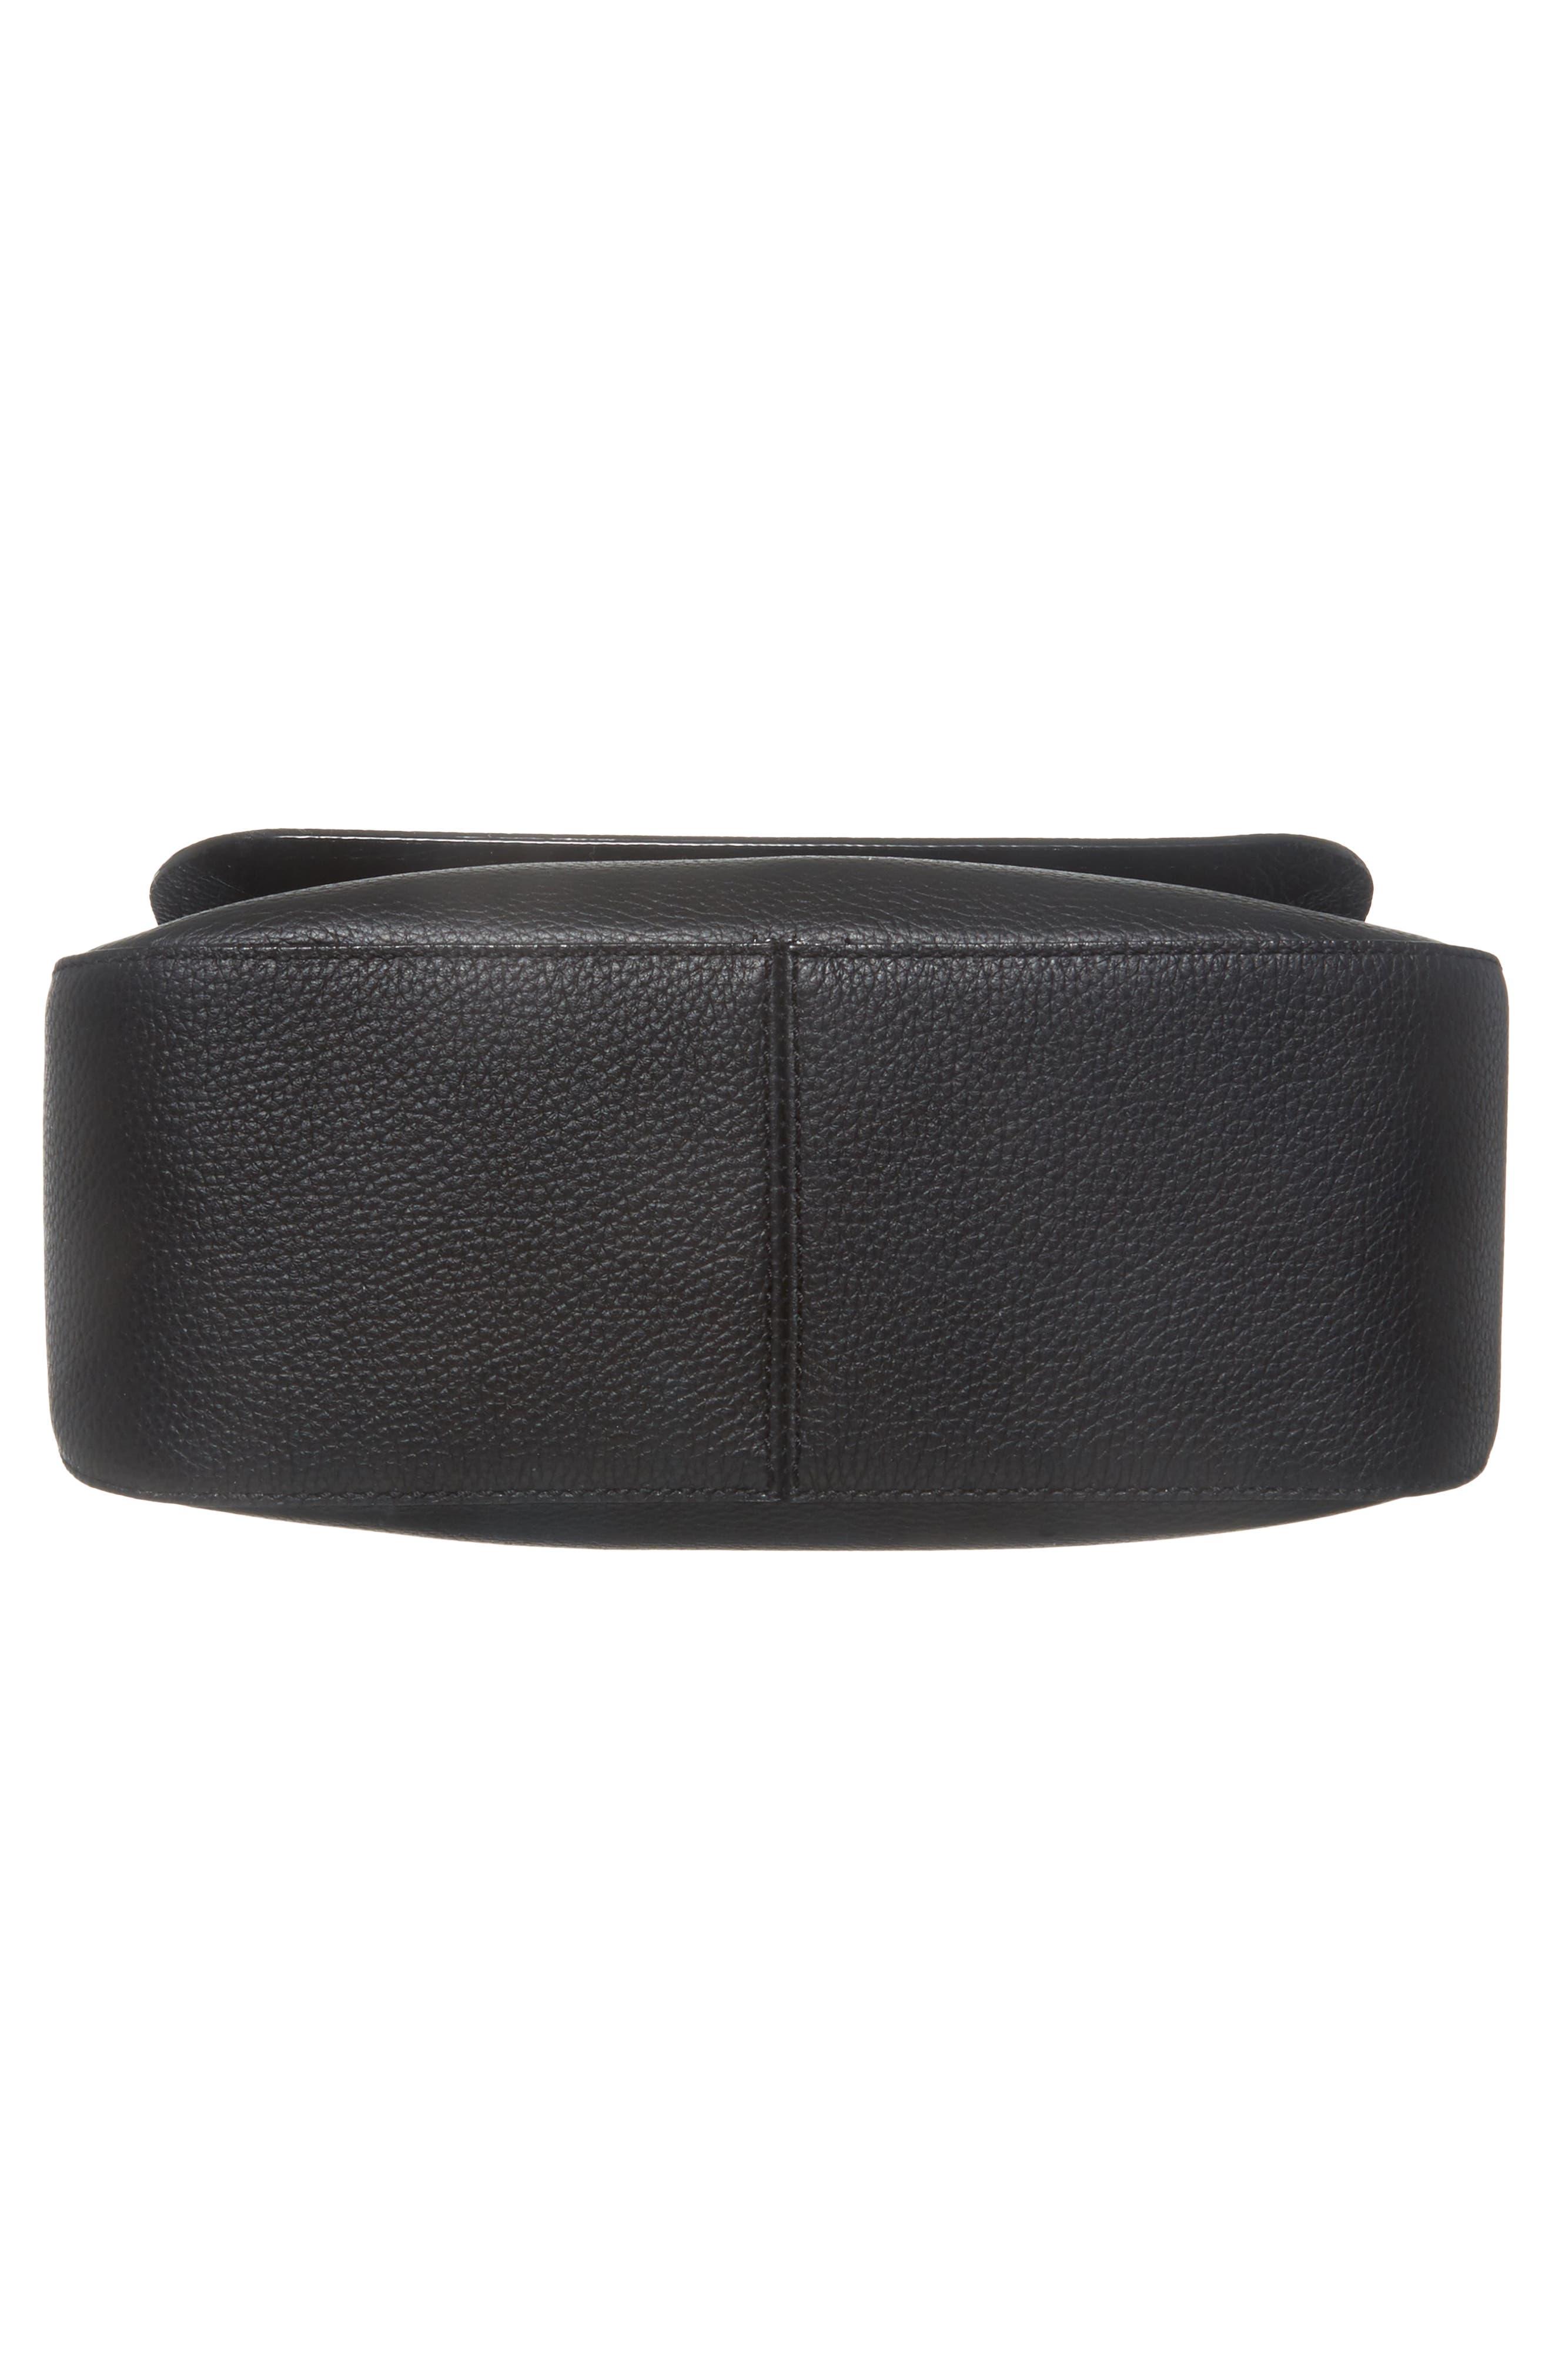 jackson street - colette leather satchel,                             Alternate thumbnail 6, color,                             BLACK